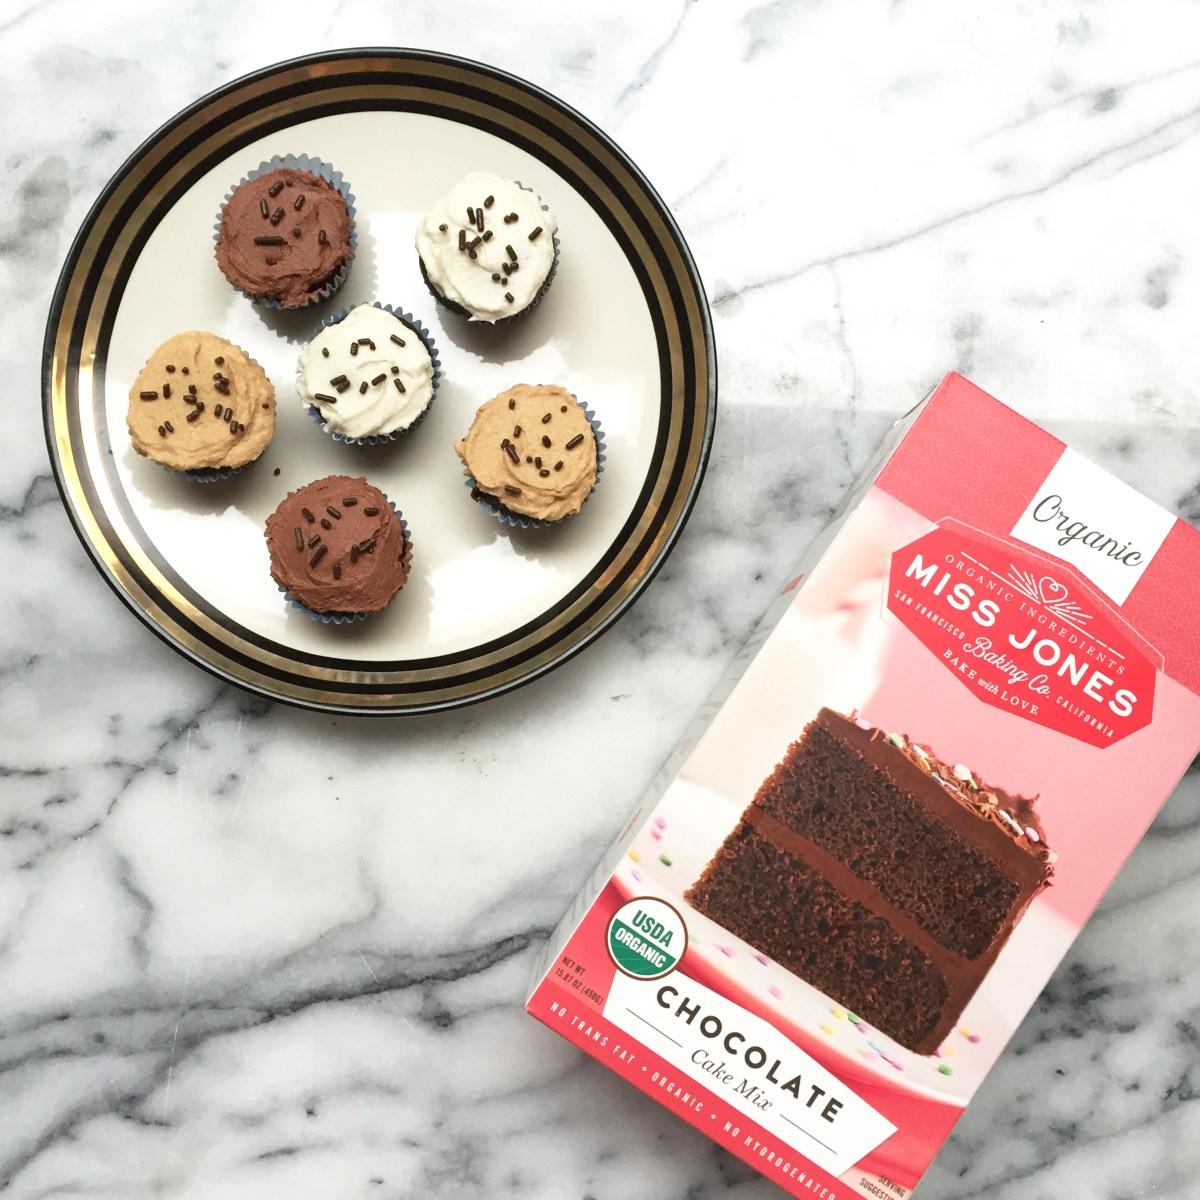 Miss Jones Cake Mix and Cupcakes